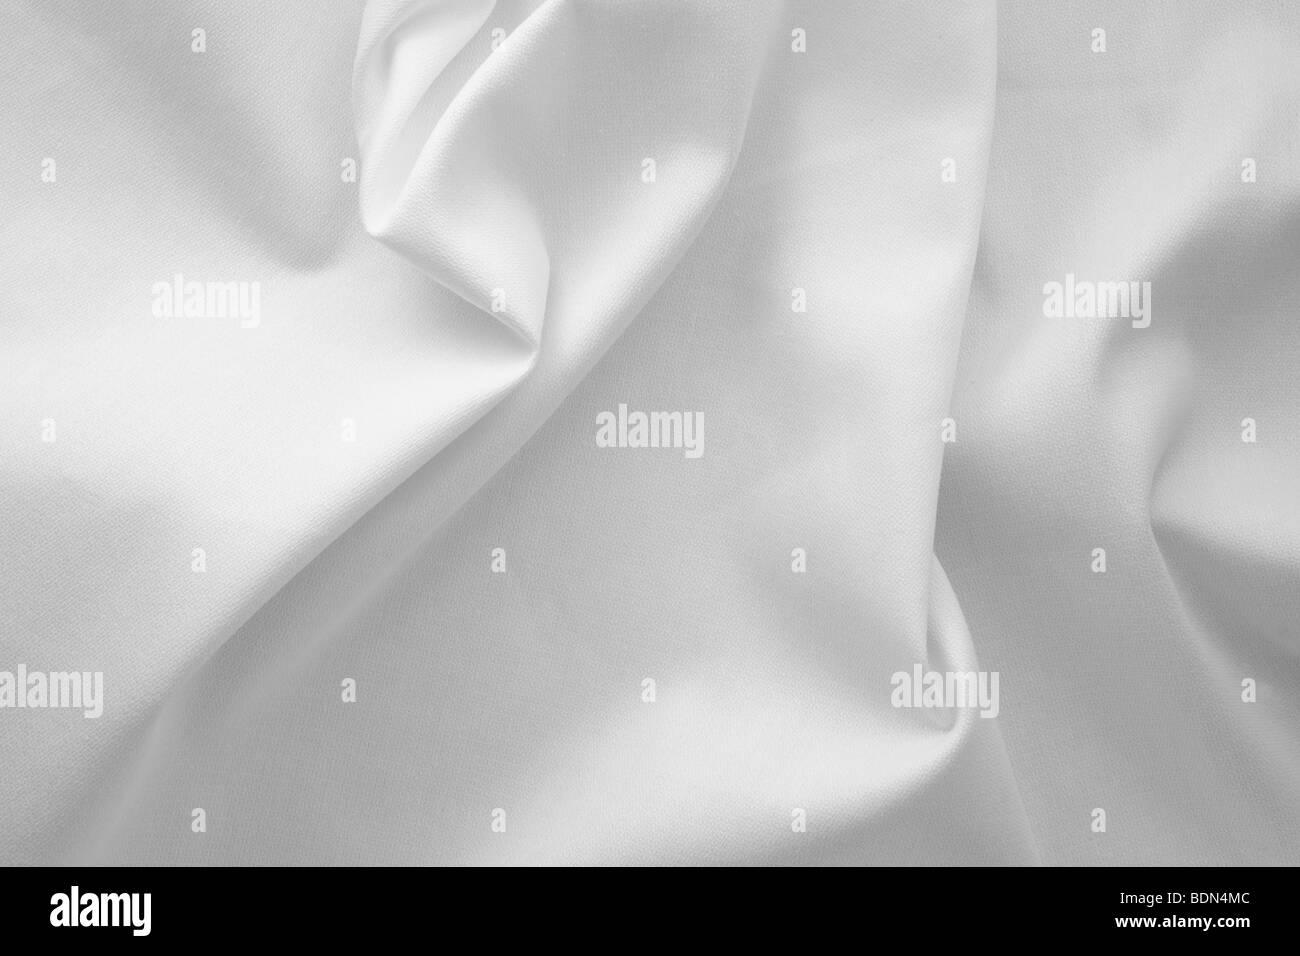 White Fabric - Stock Image